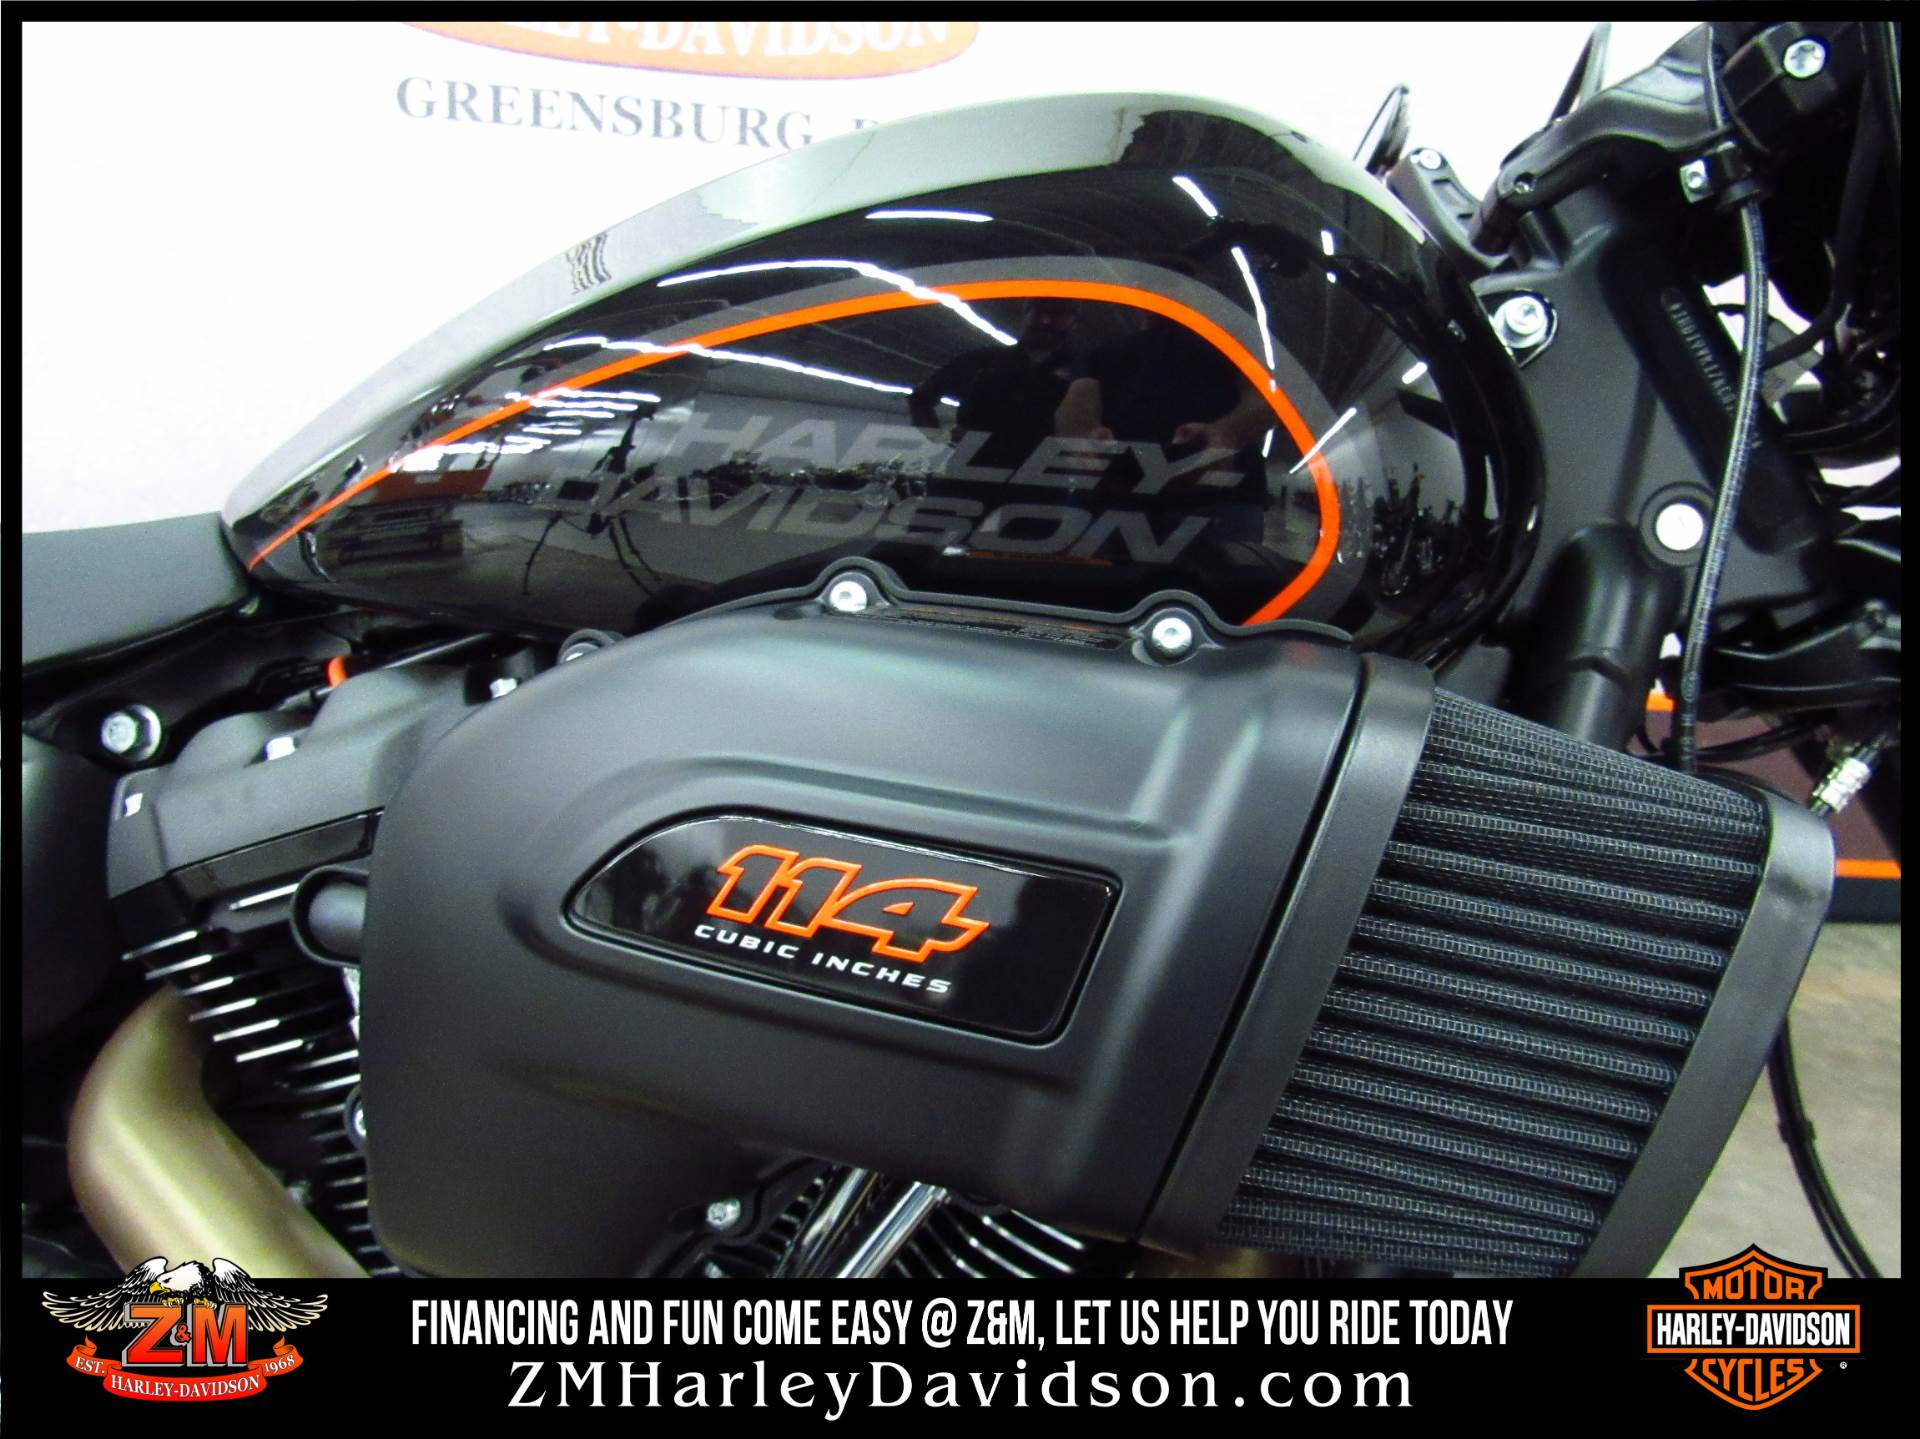 2019 Harley Davidson Fxdr 114 Motorcycles Greensburg